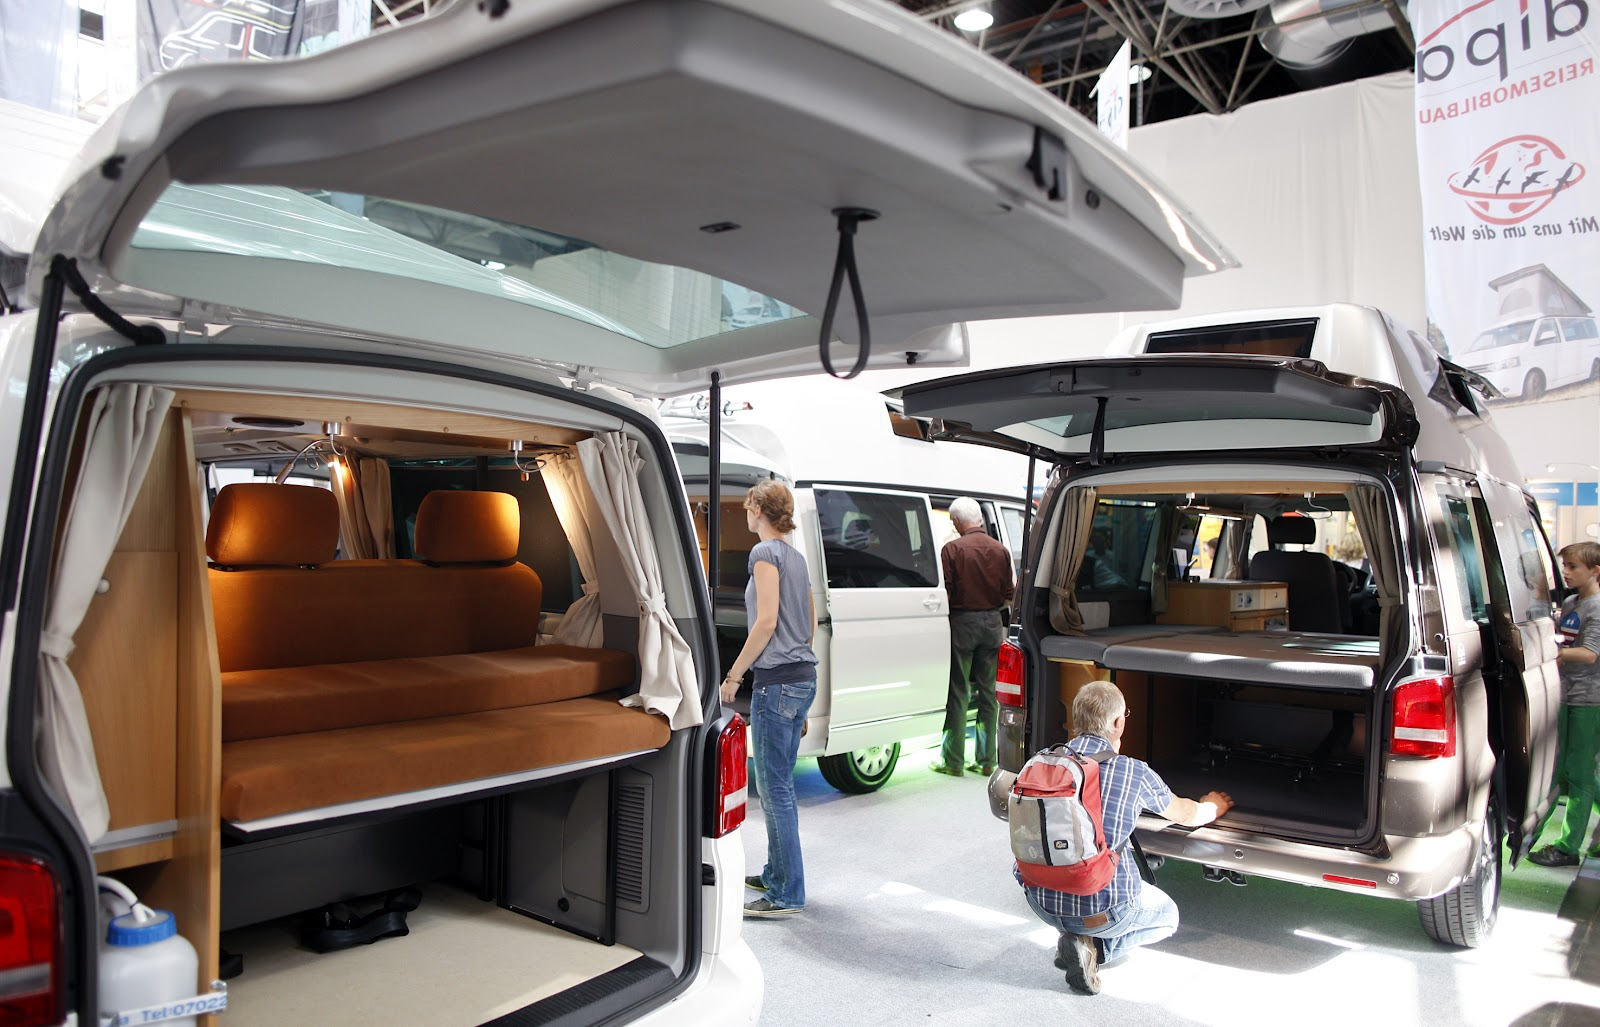 caravan salon d sseldorf 2012 mobile aspekte